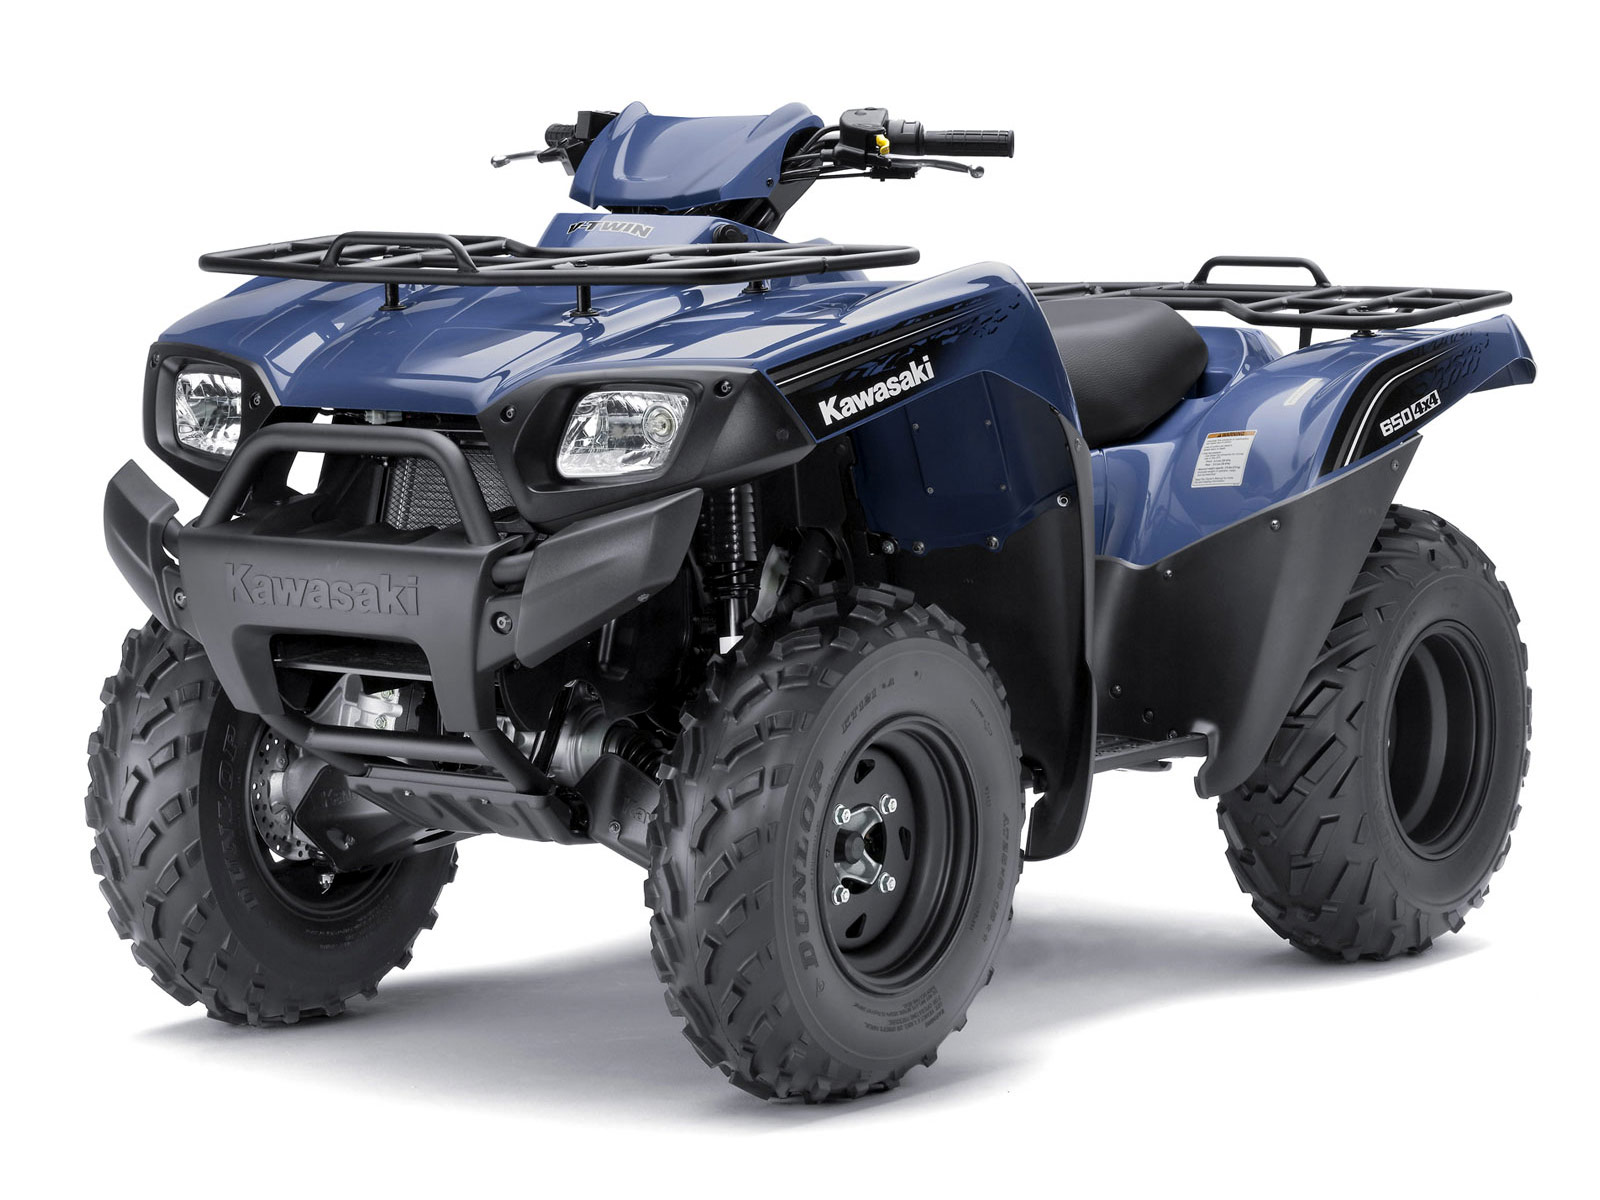 Kawasaki 4 Wheelers Brute Force